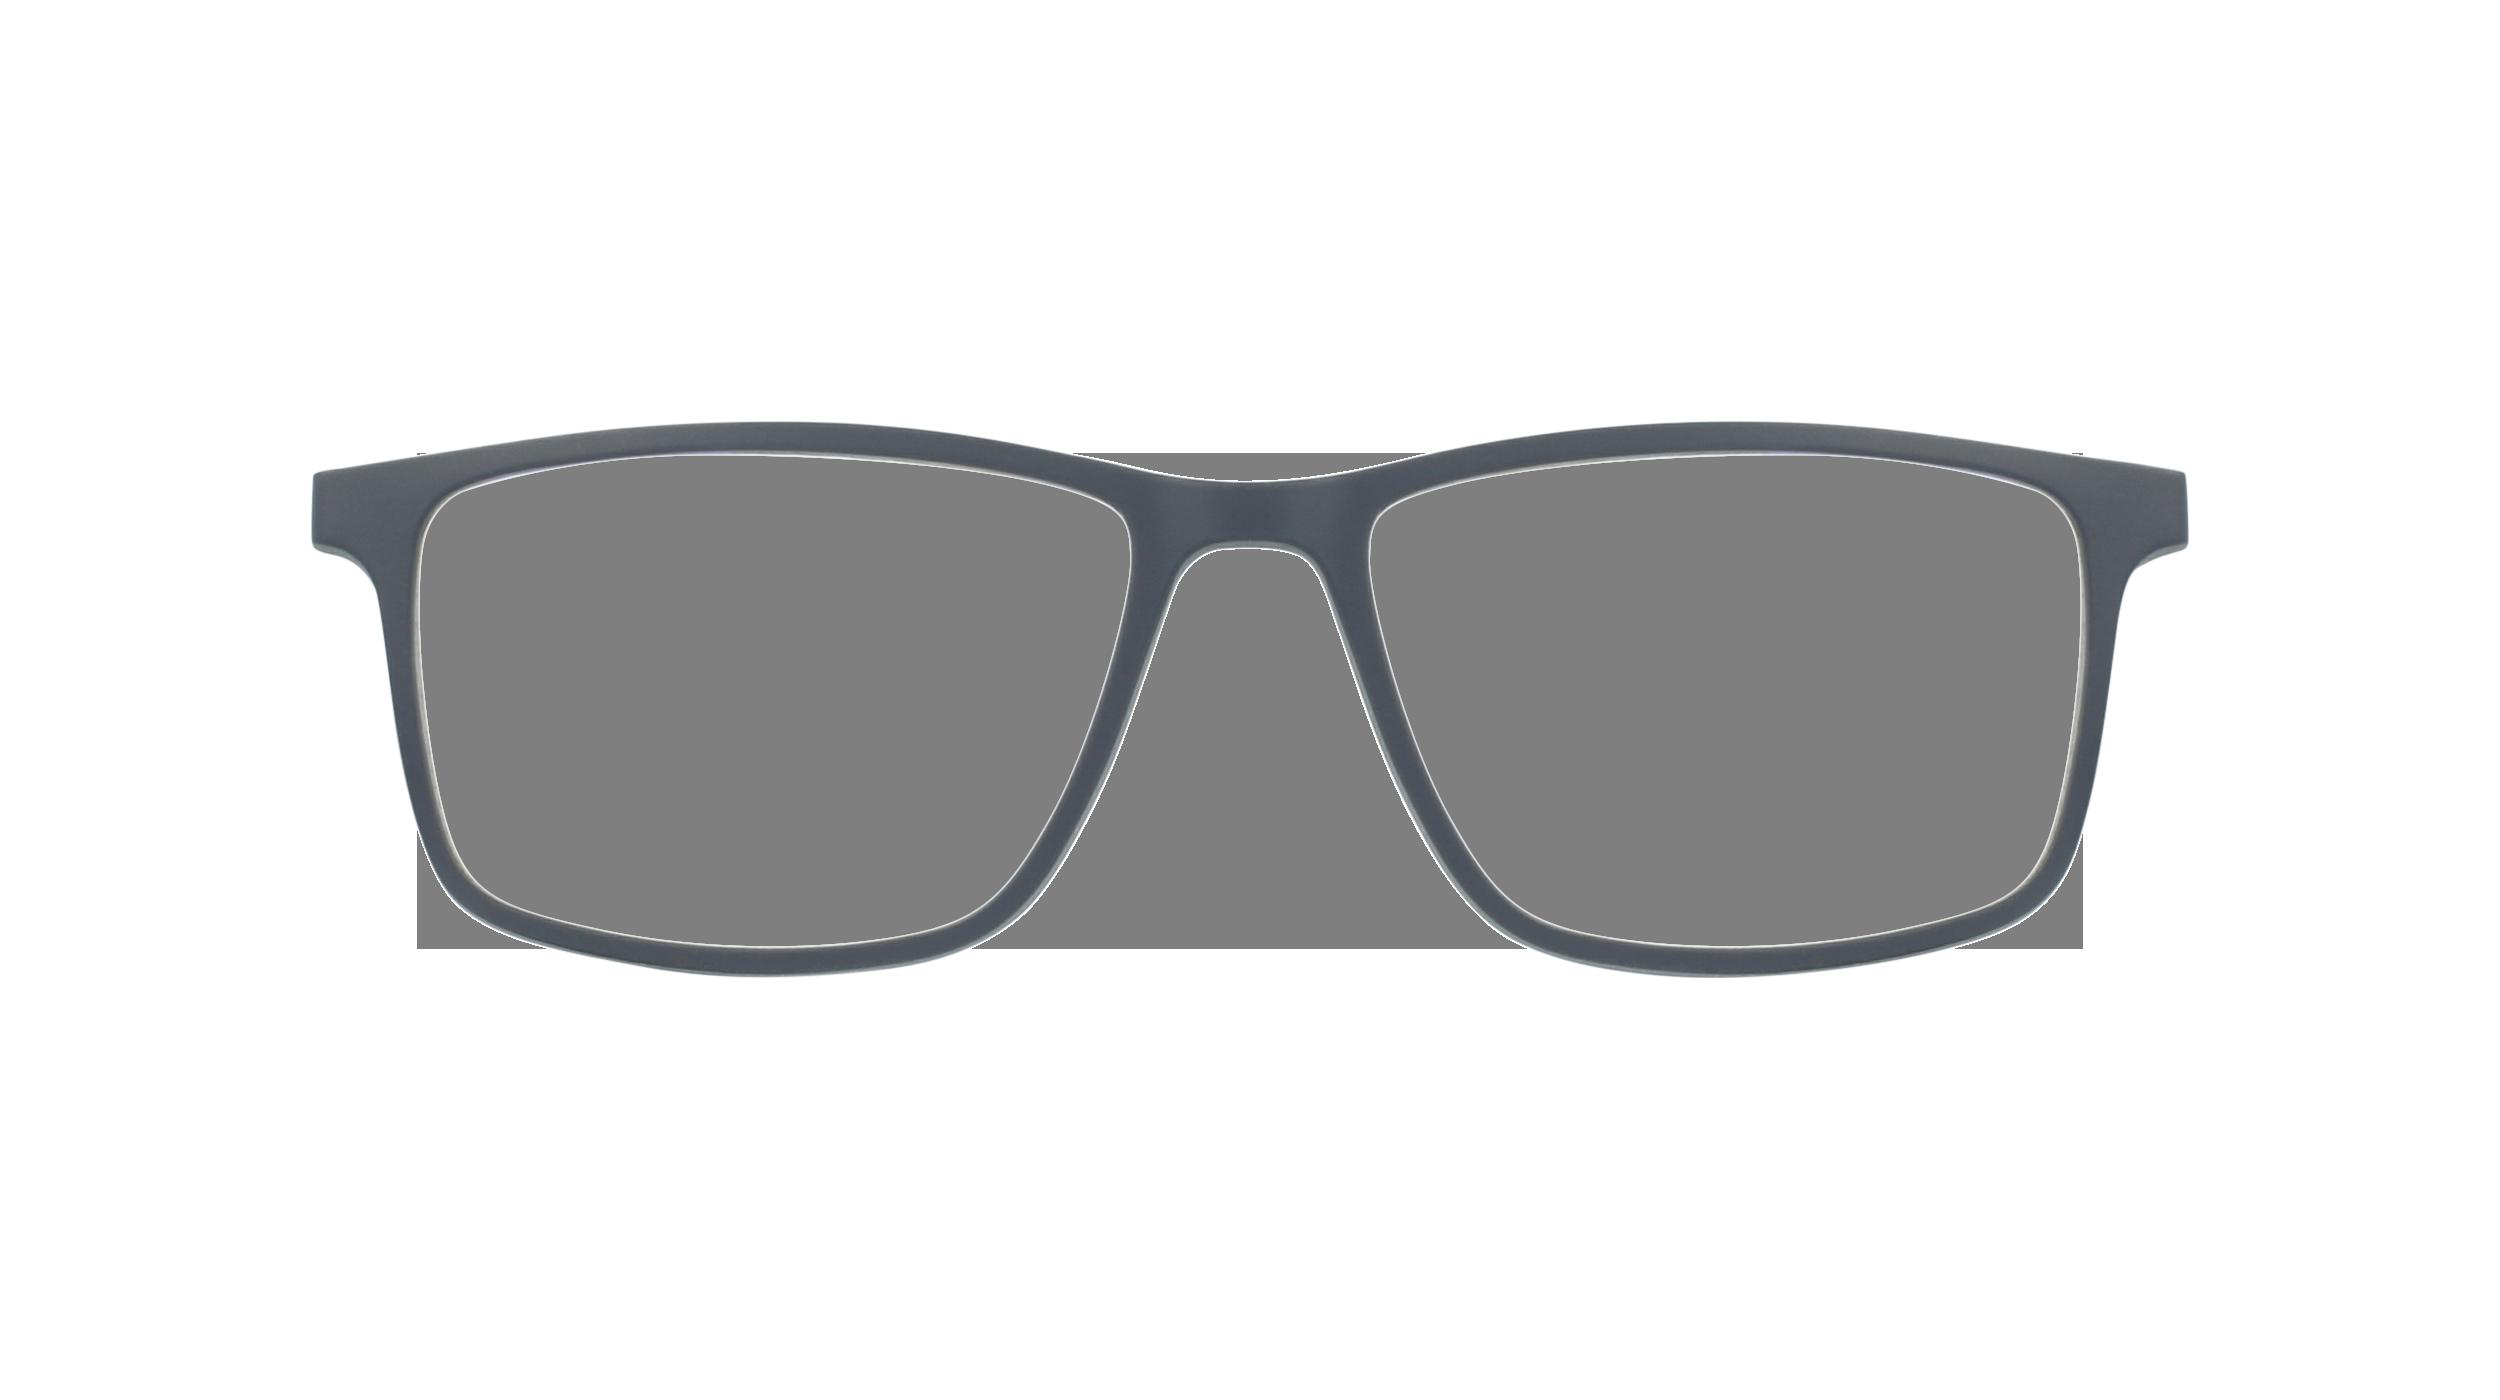 afflelou/france/products/smart_clip/clips_glasses/07630036457054.png